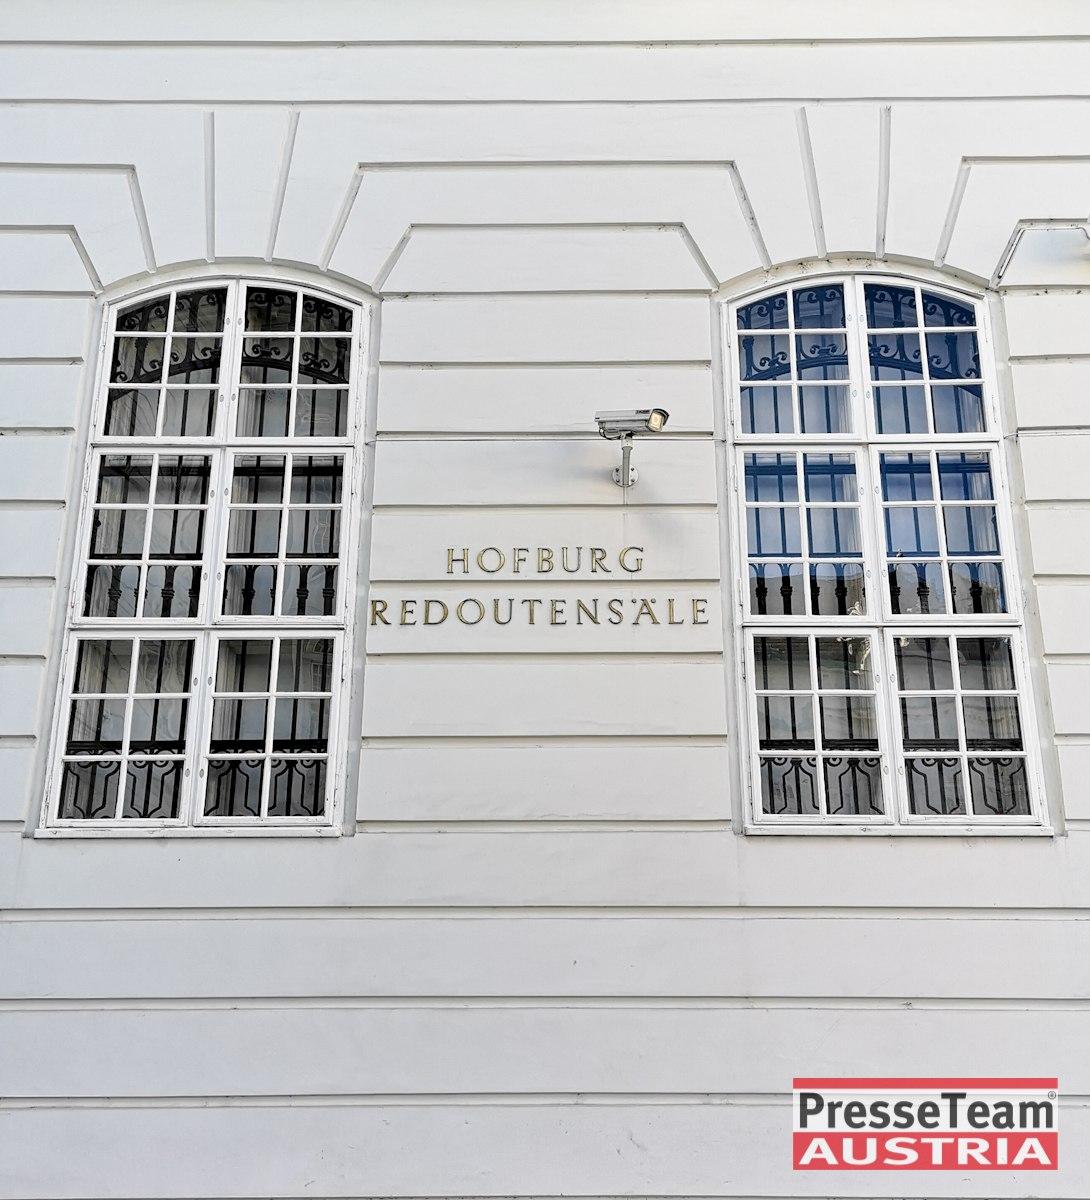 Messe Hofburg Wien 110 - Luxus Möbelmesse & Lifestyle in der Hofburg Wien